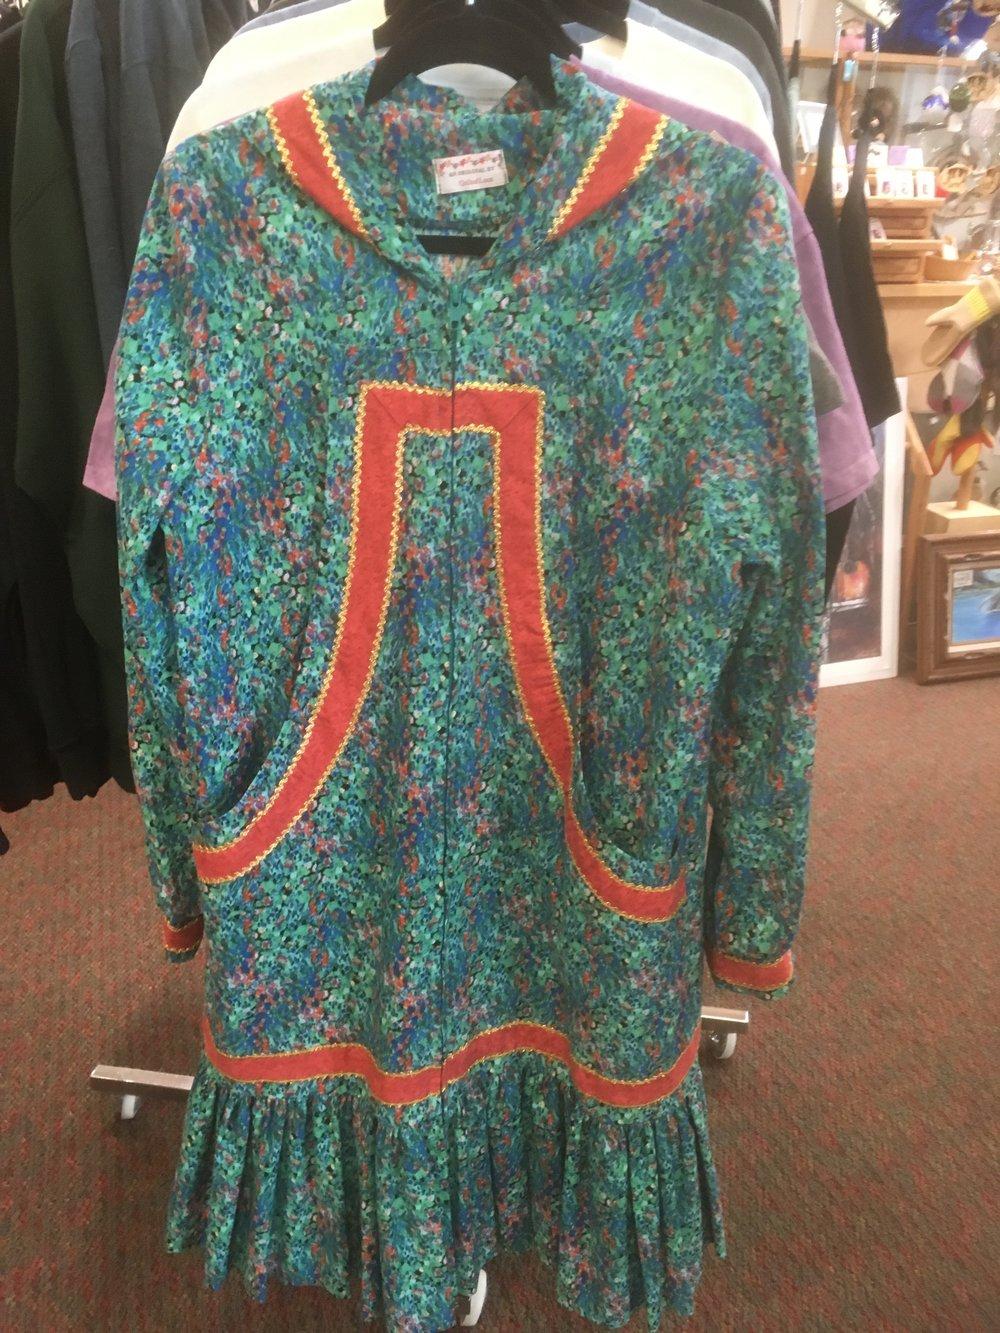 MAS - Kuspuks - An Alaskan Fashion Statement (2) WEB.JPG